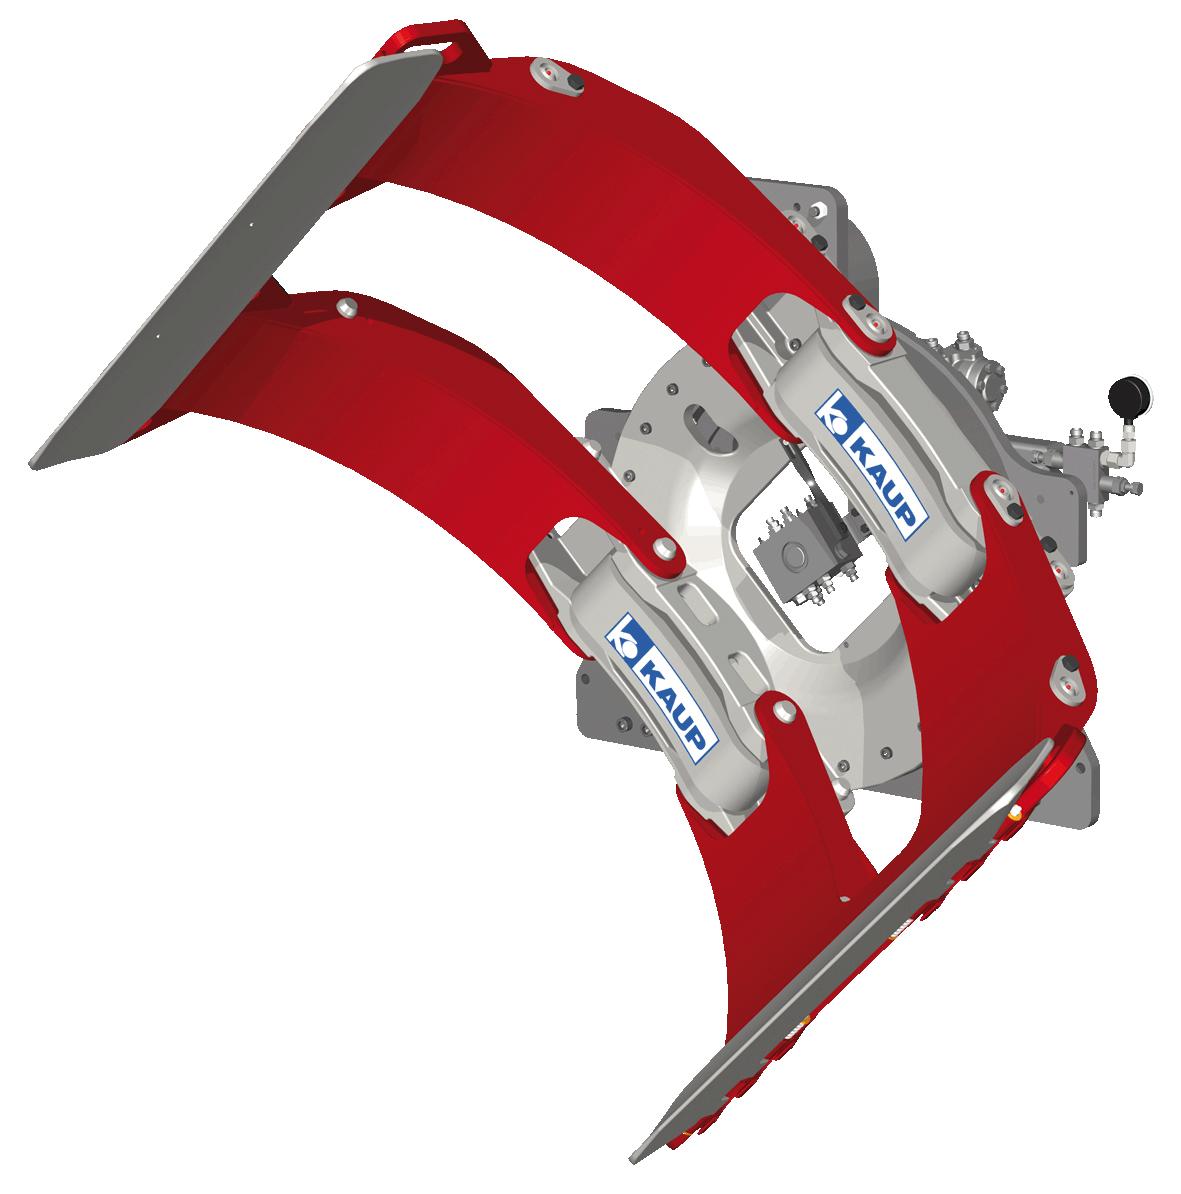 Sisteme cu rotire (furci cu clamp, clampuri, cupe etc.) KAUP - Poza 2